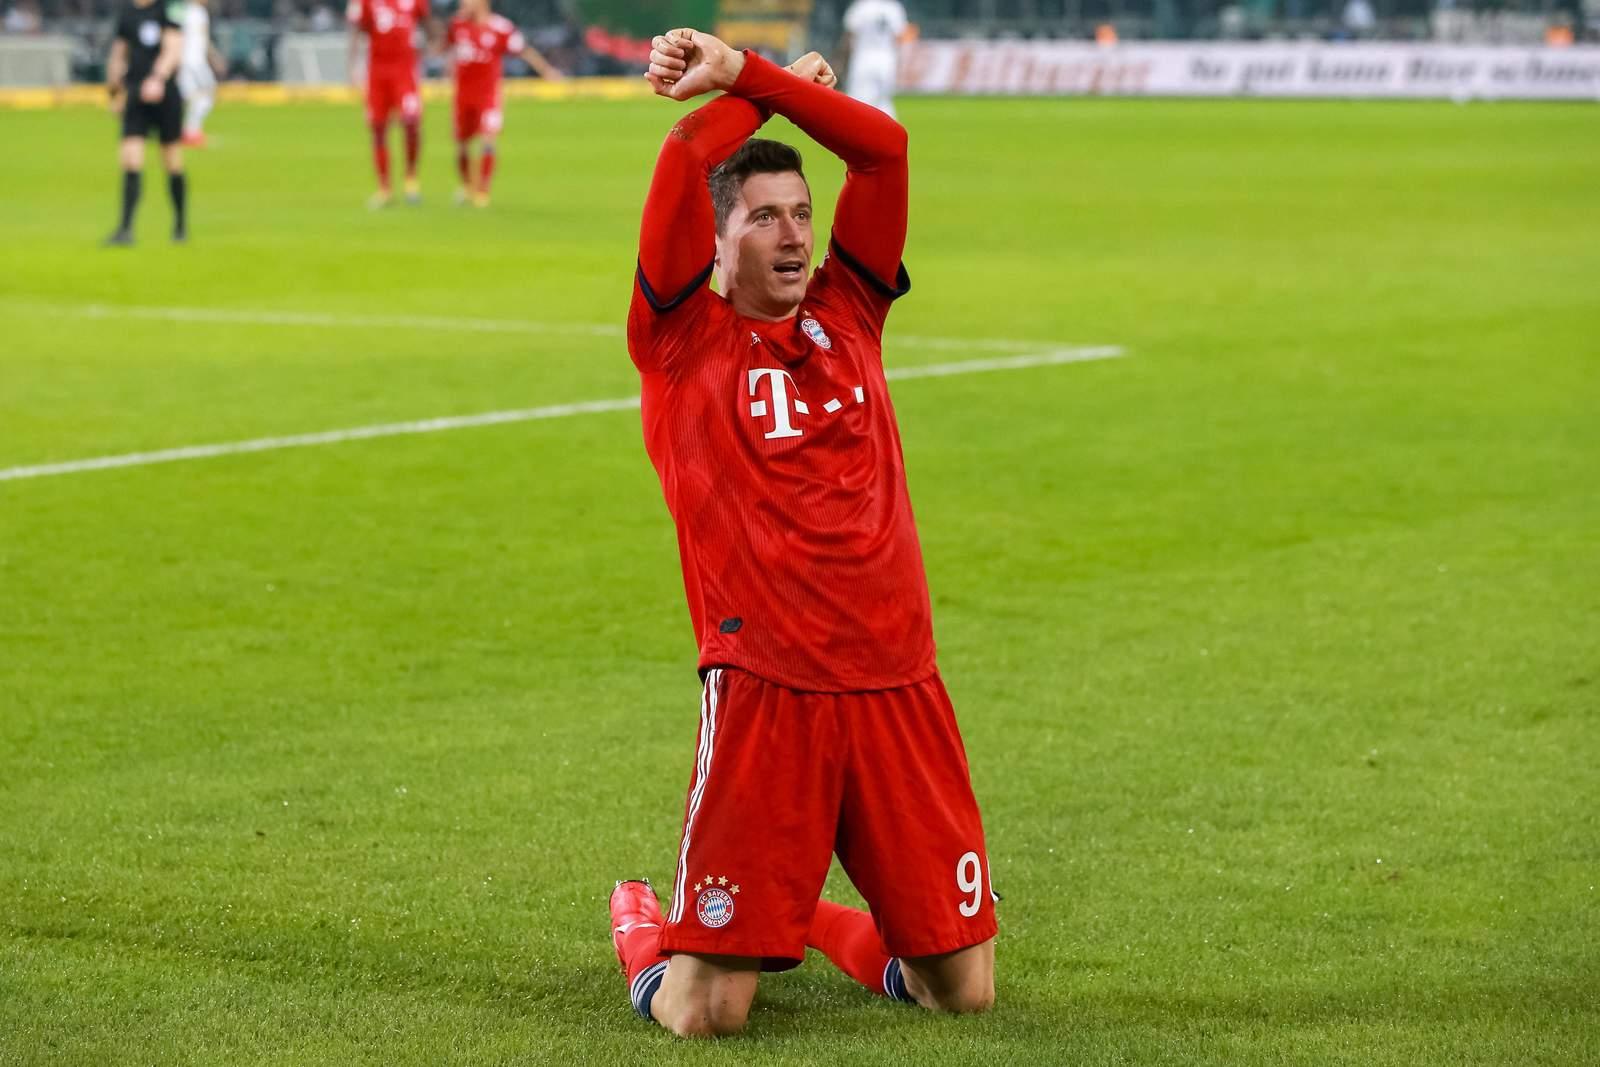 Robert Lewandowski jubelt. Jetzt auf den Champions League Sieger 2020 wetten